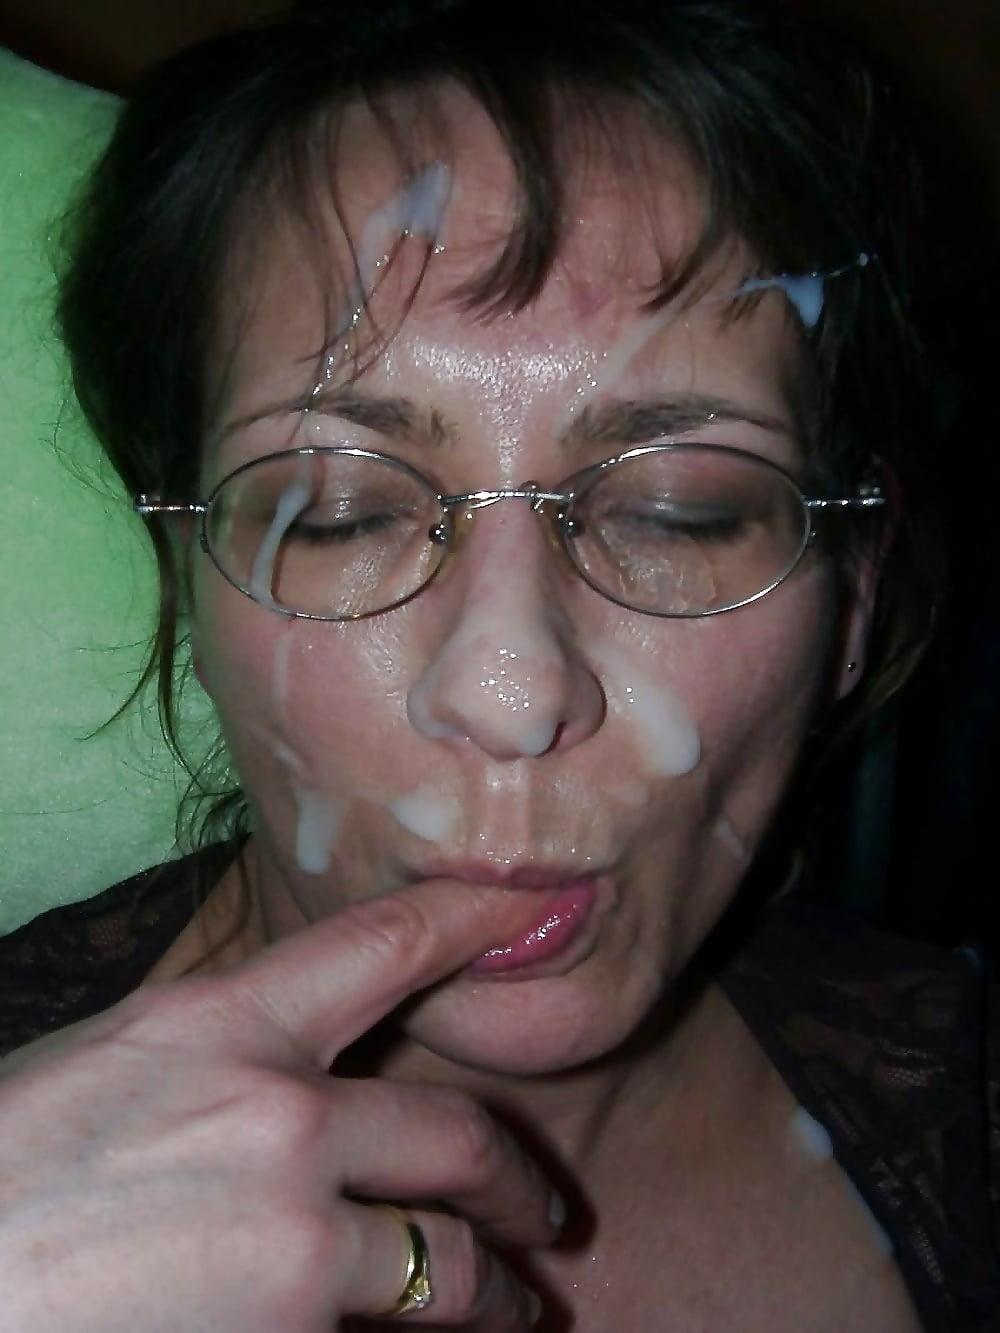 Фото зрелых со спермой на лице — 9